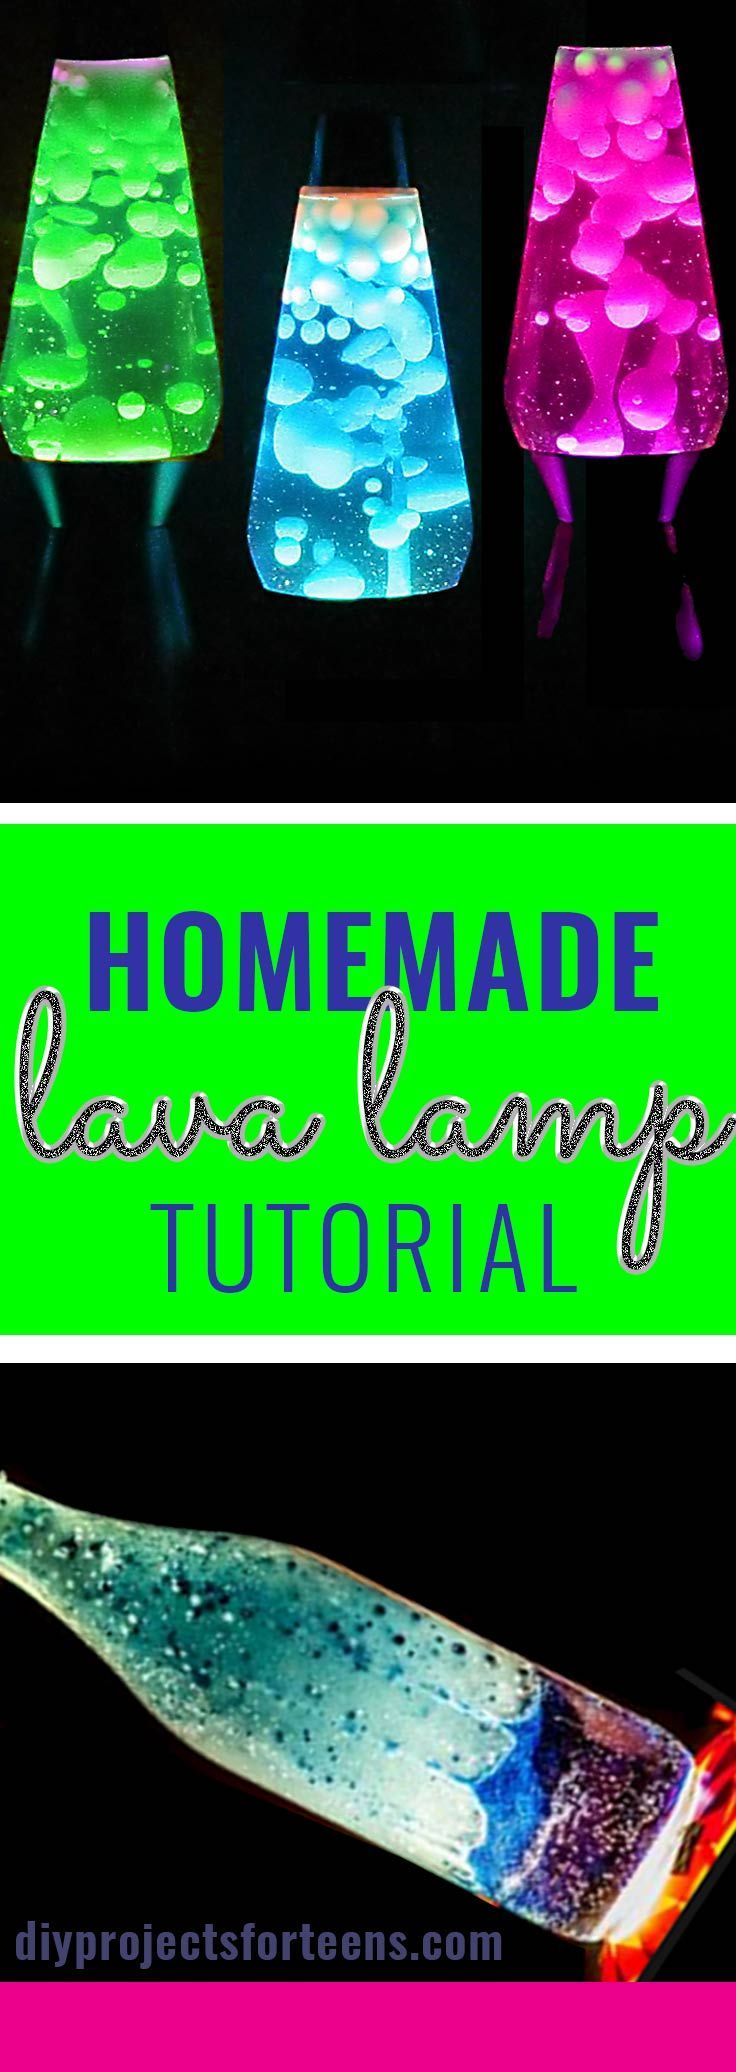 Diy Lava Lamp Tutorial Fun And Quick Diy Project Idea For Kids And Teens Diy Project Quick Teens Tutorial Lava Lamp Diy Kids Rooms Diy Diy For Teens